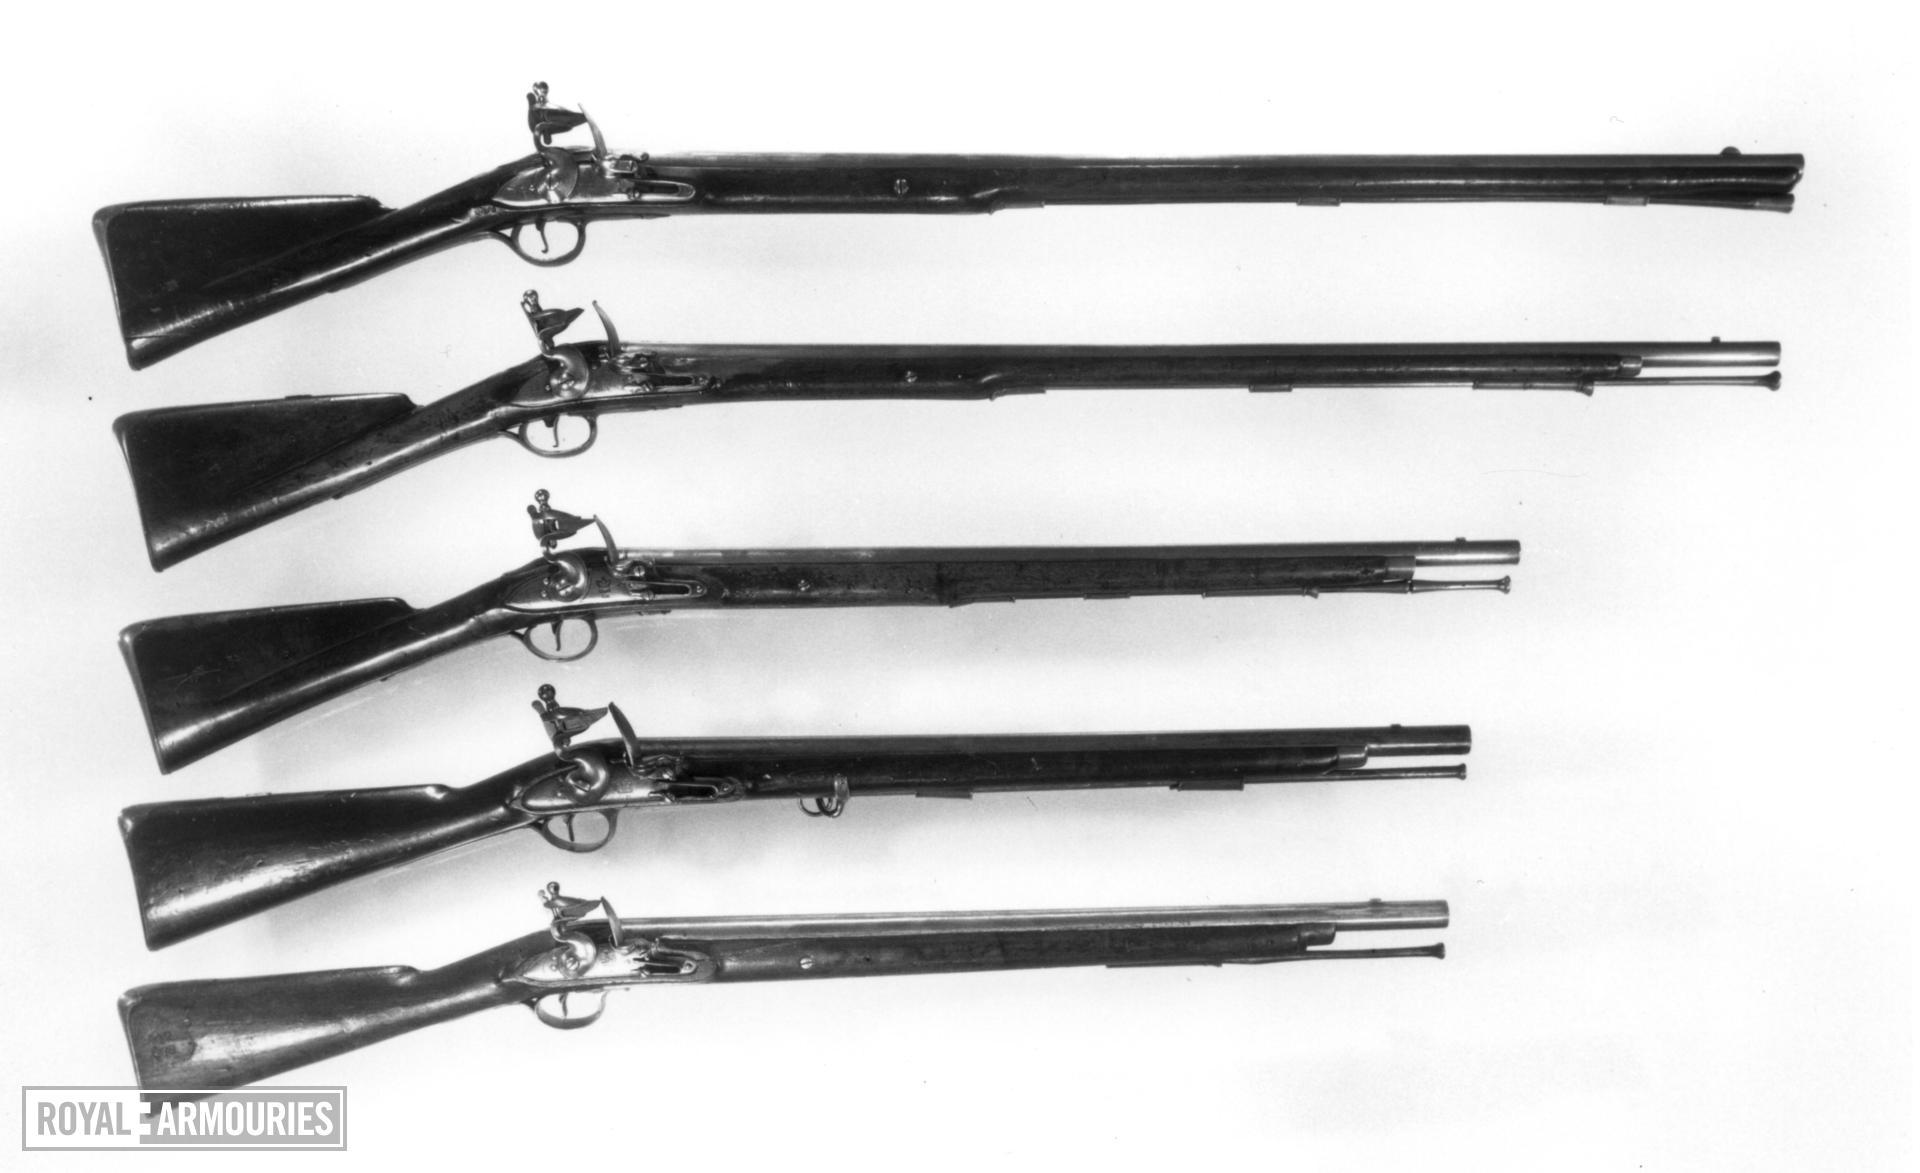 Flintlock muzzle-loading military carbine - Pattern 1756 Light Dragoon